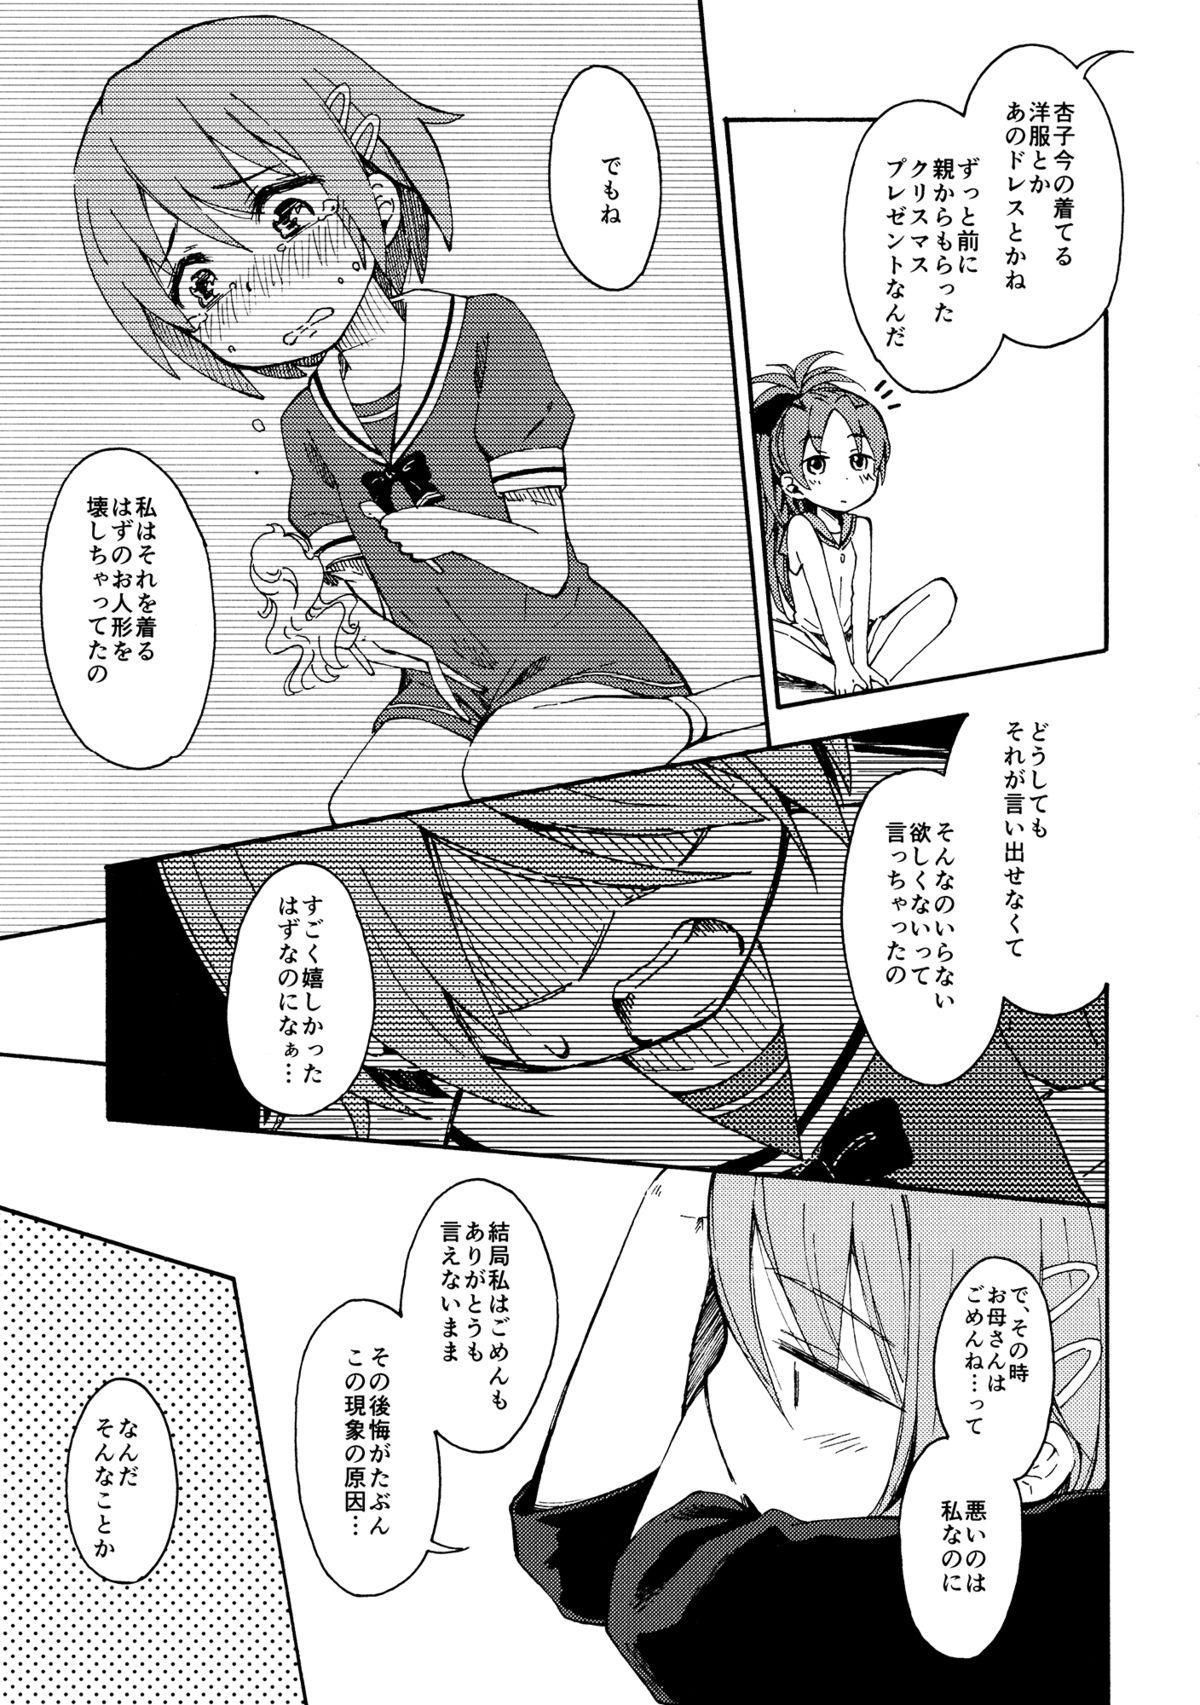 Lovely Girls' Lily Vol. 11 13